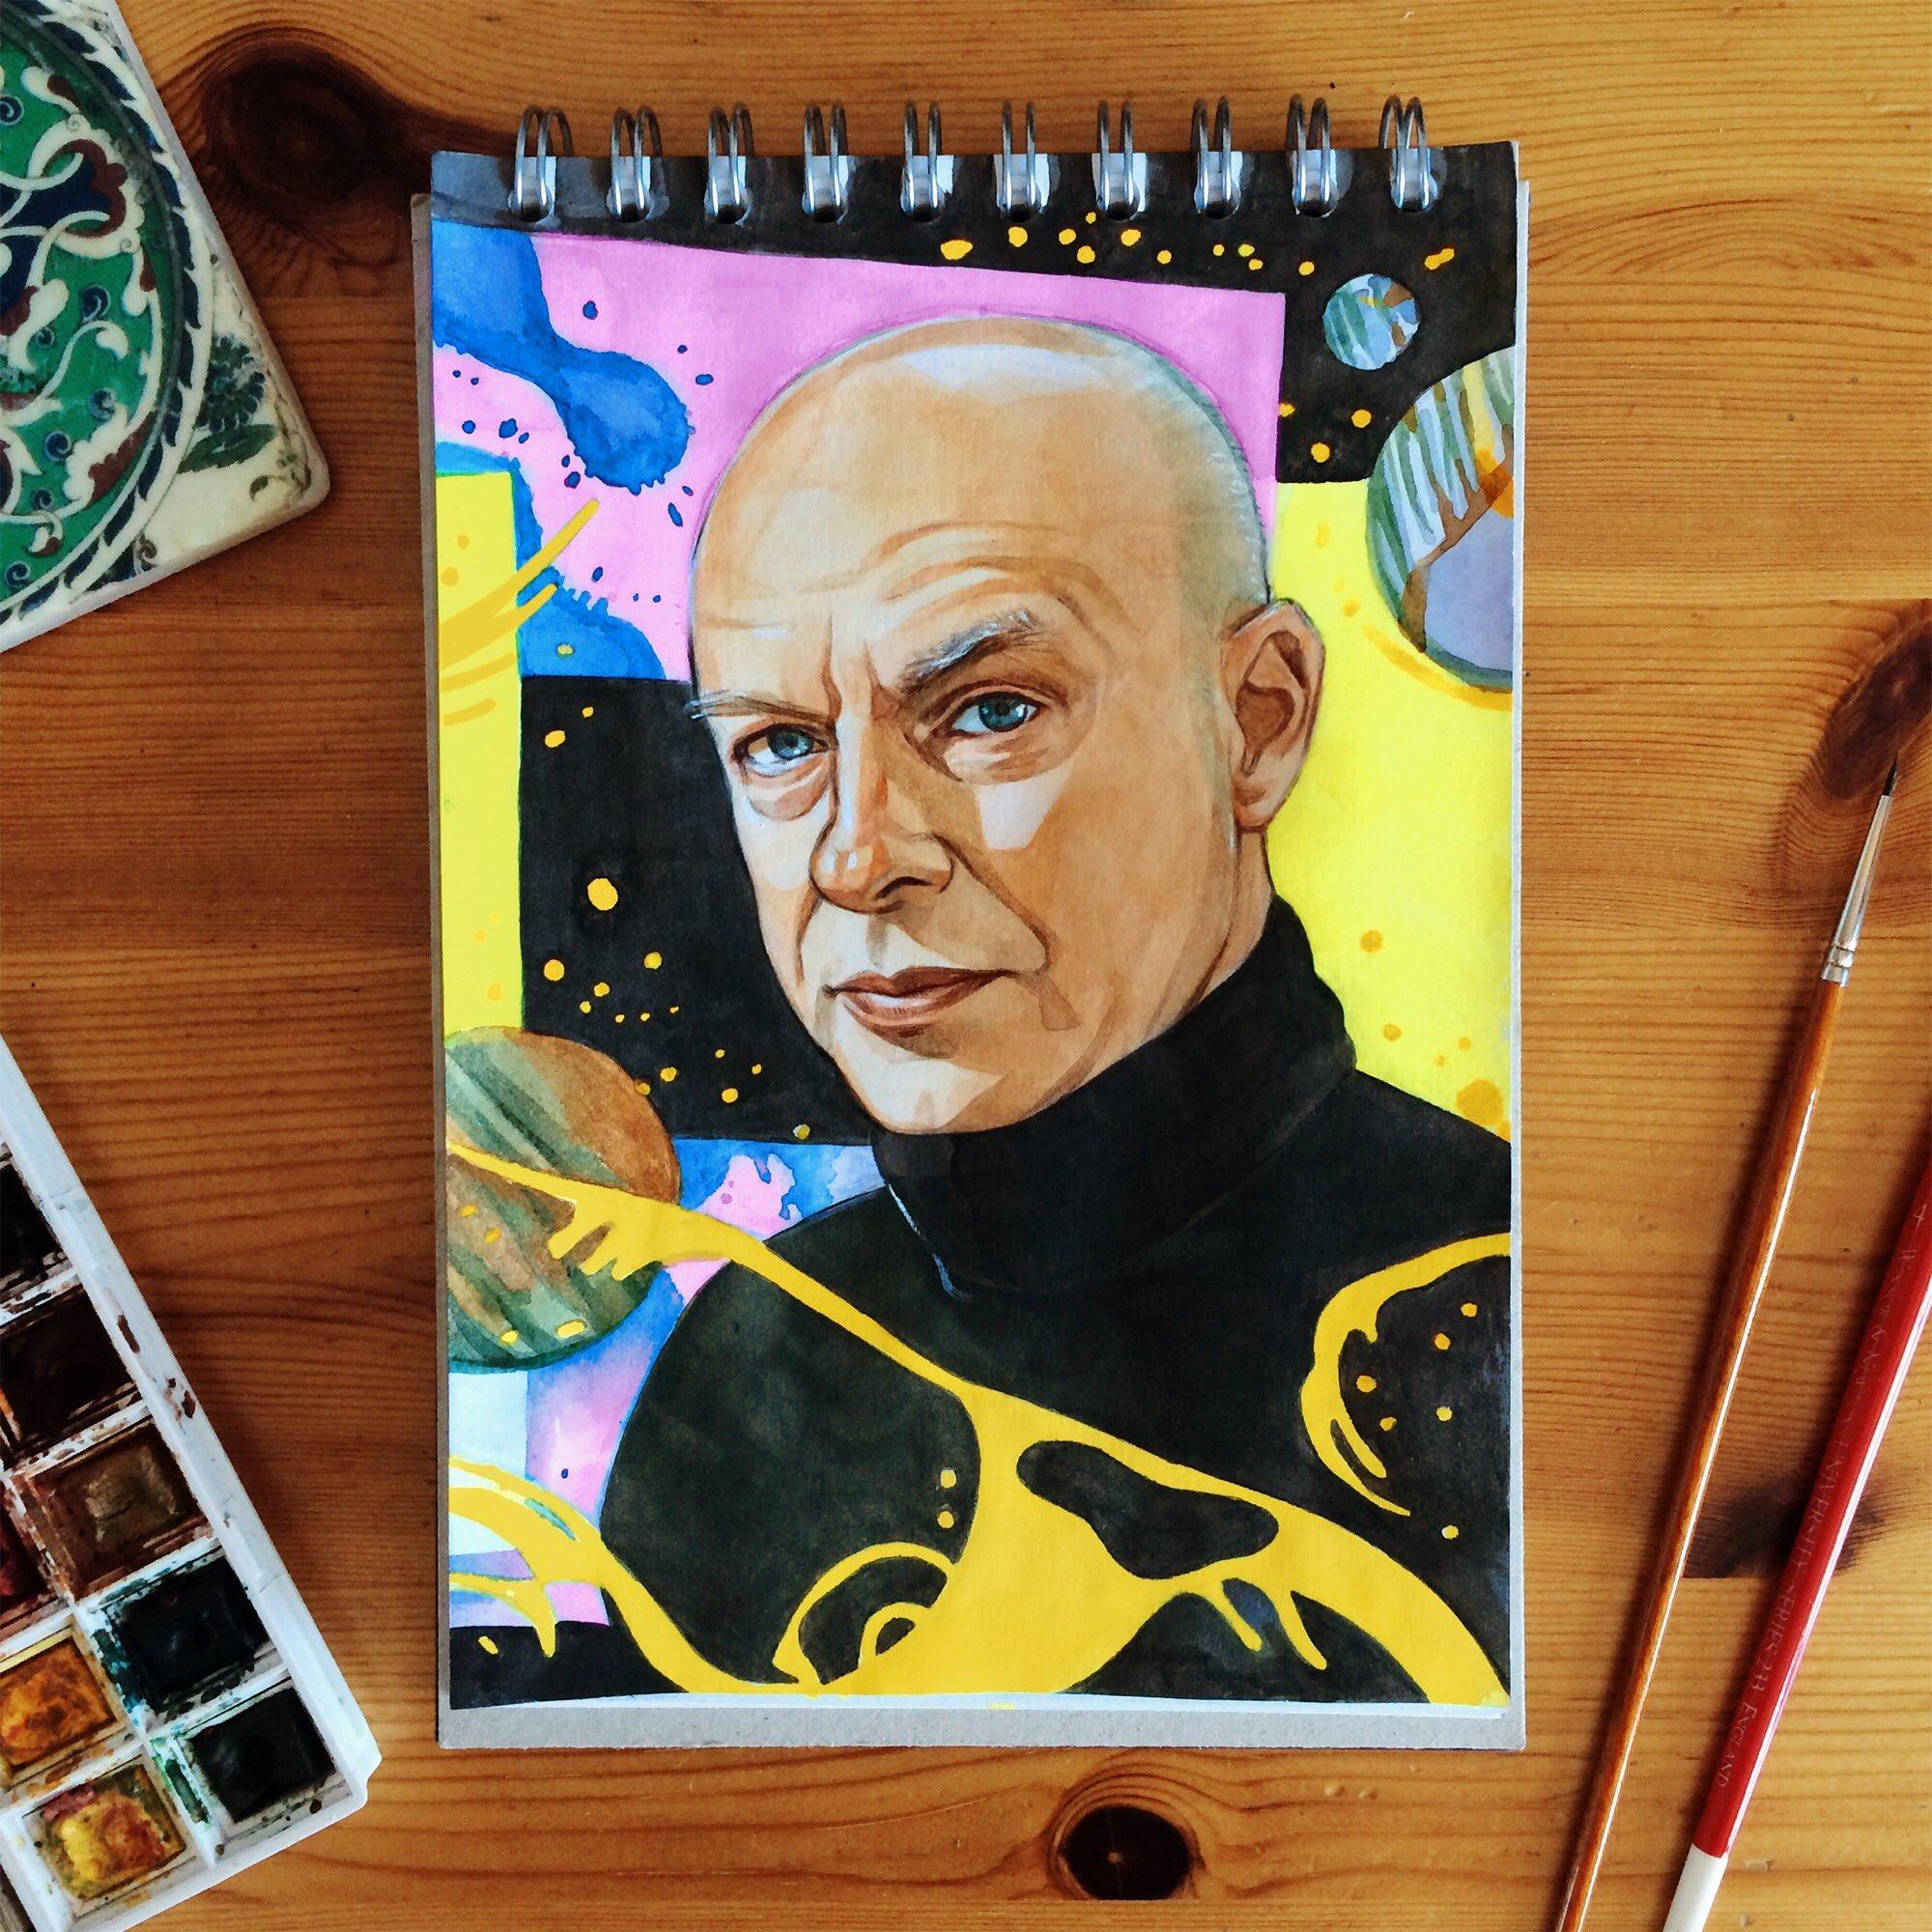 Happy 70th Birthday to Brian Eno!